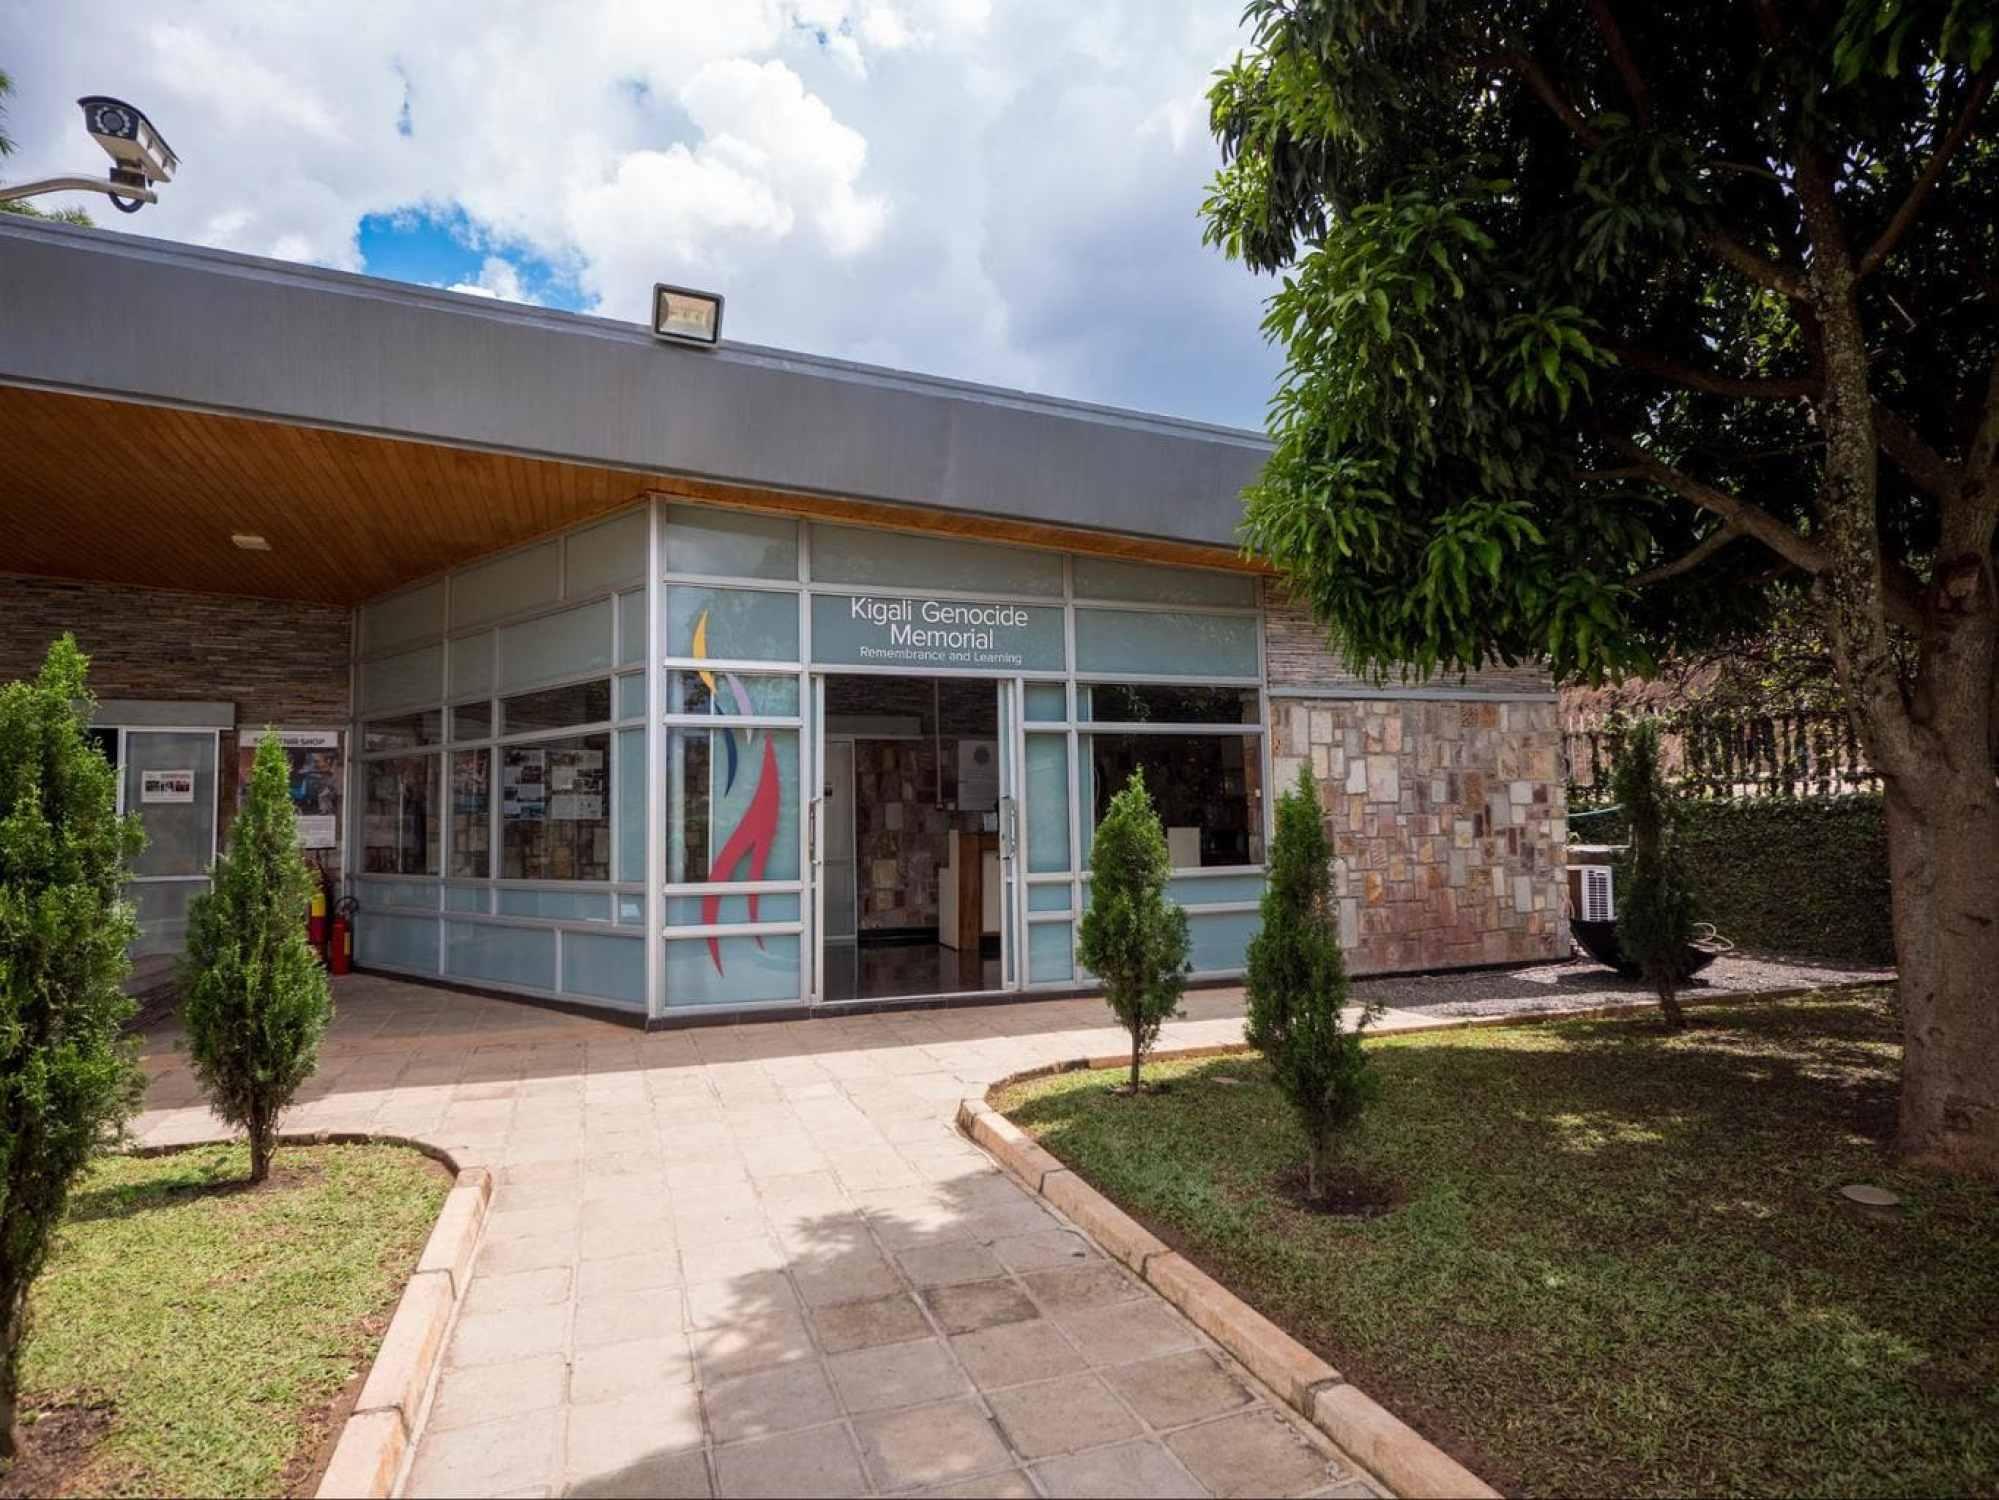 The Kigali Genocide Memorial